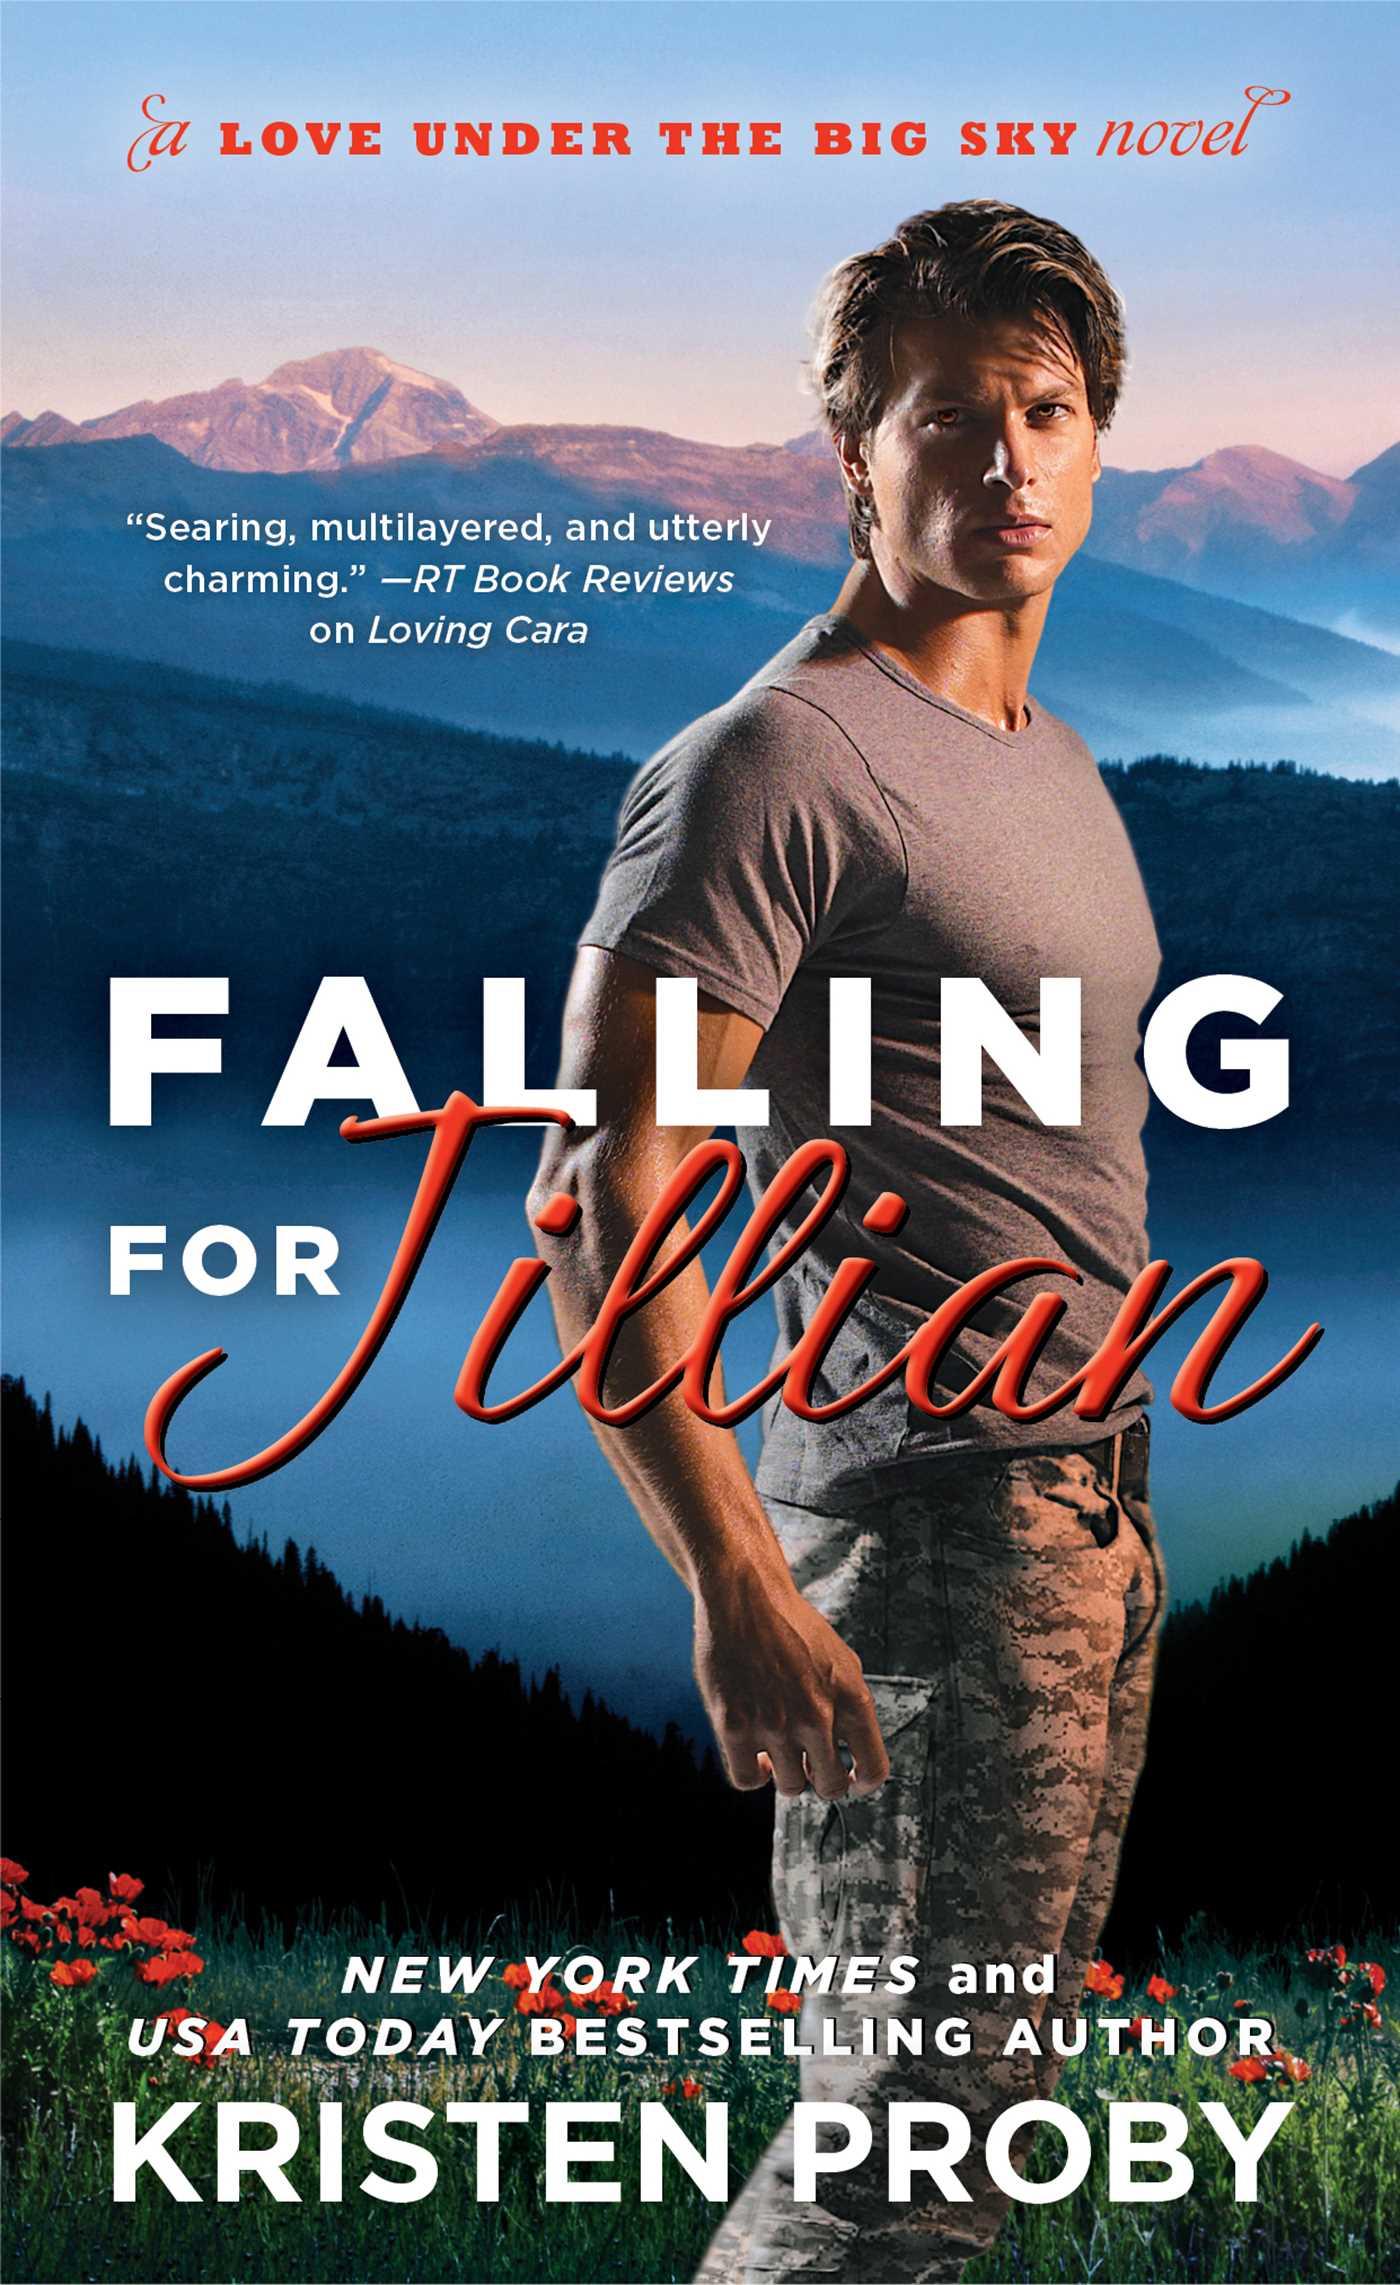 Falling for jillian 9781476759388 hr